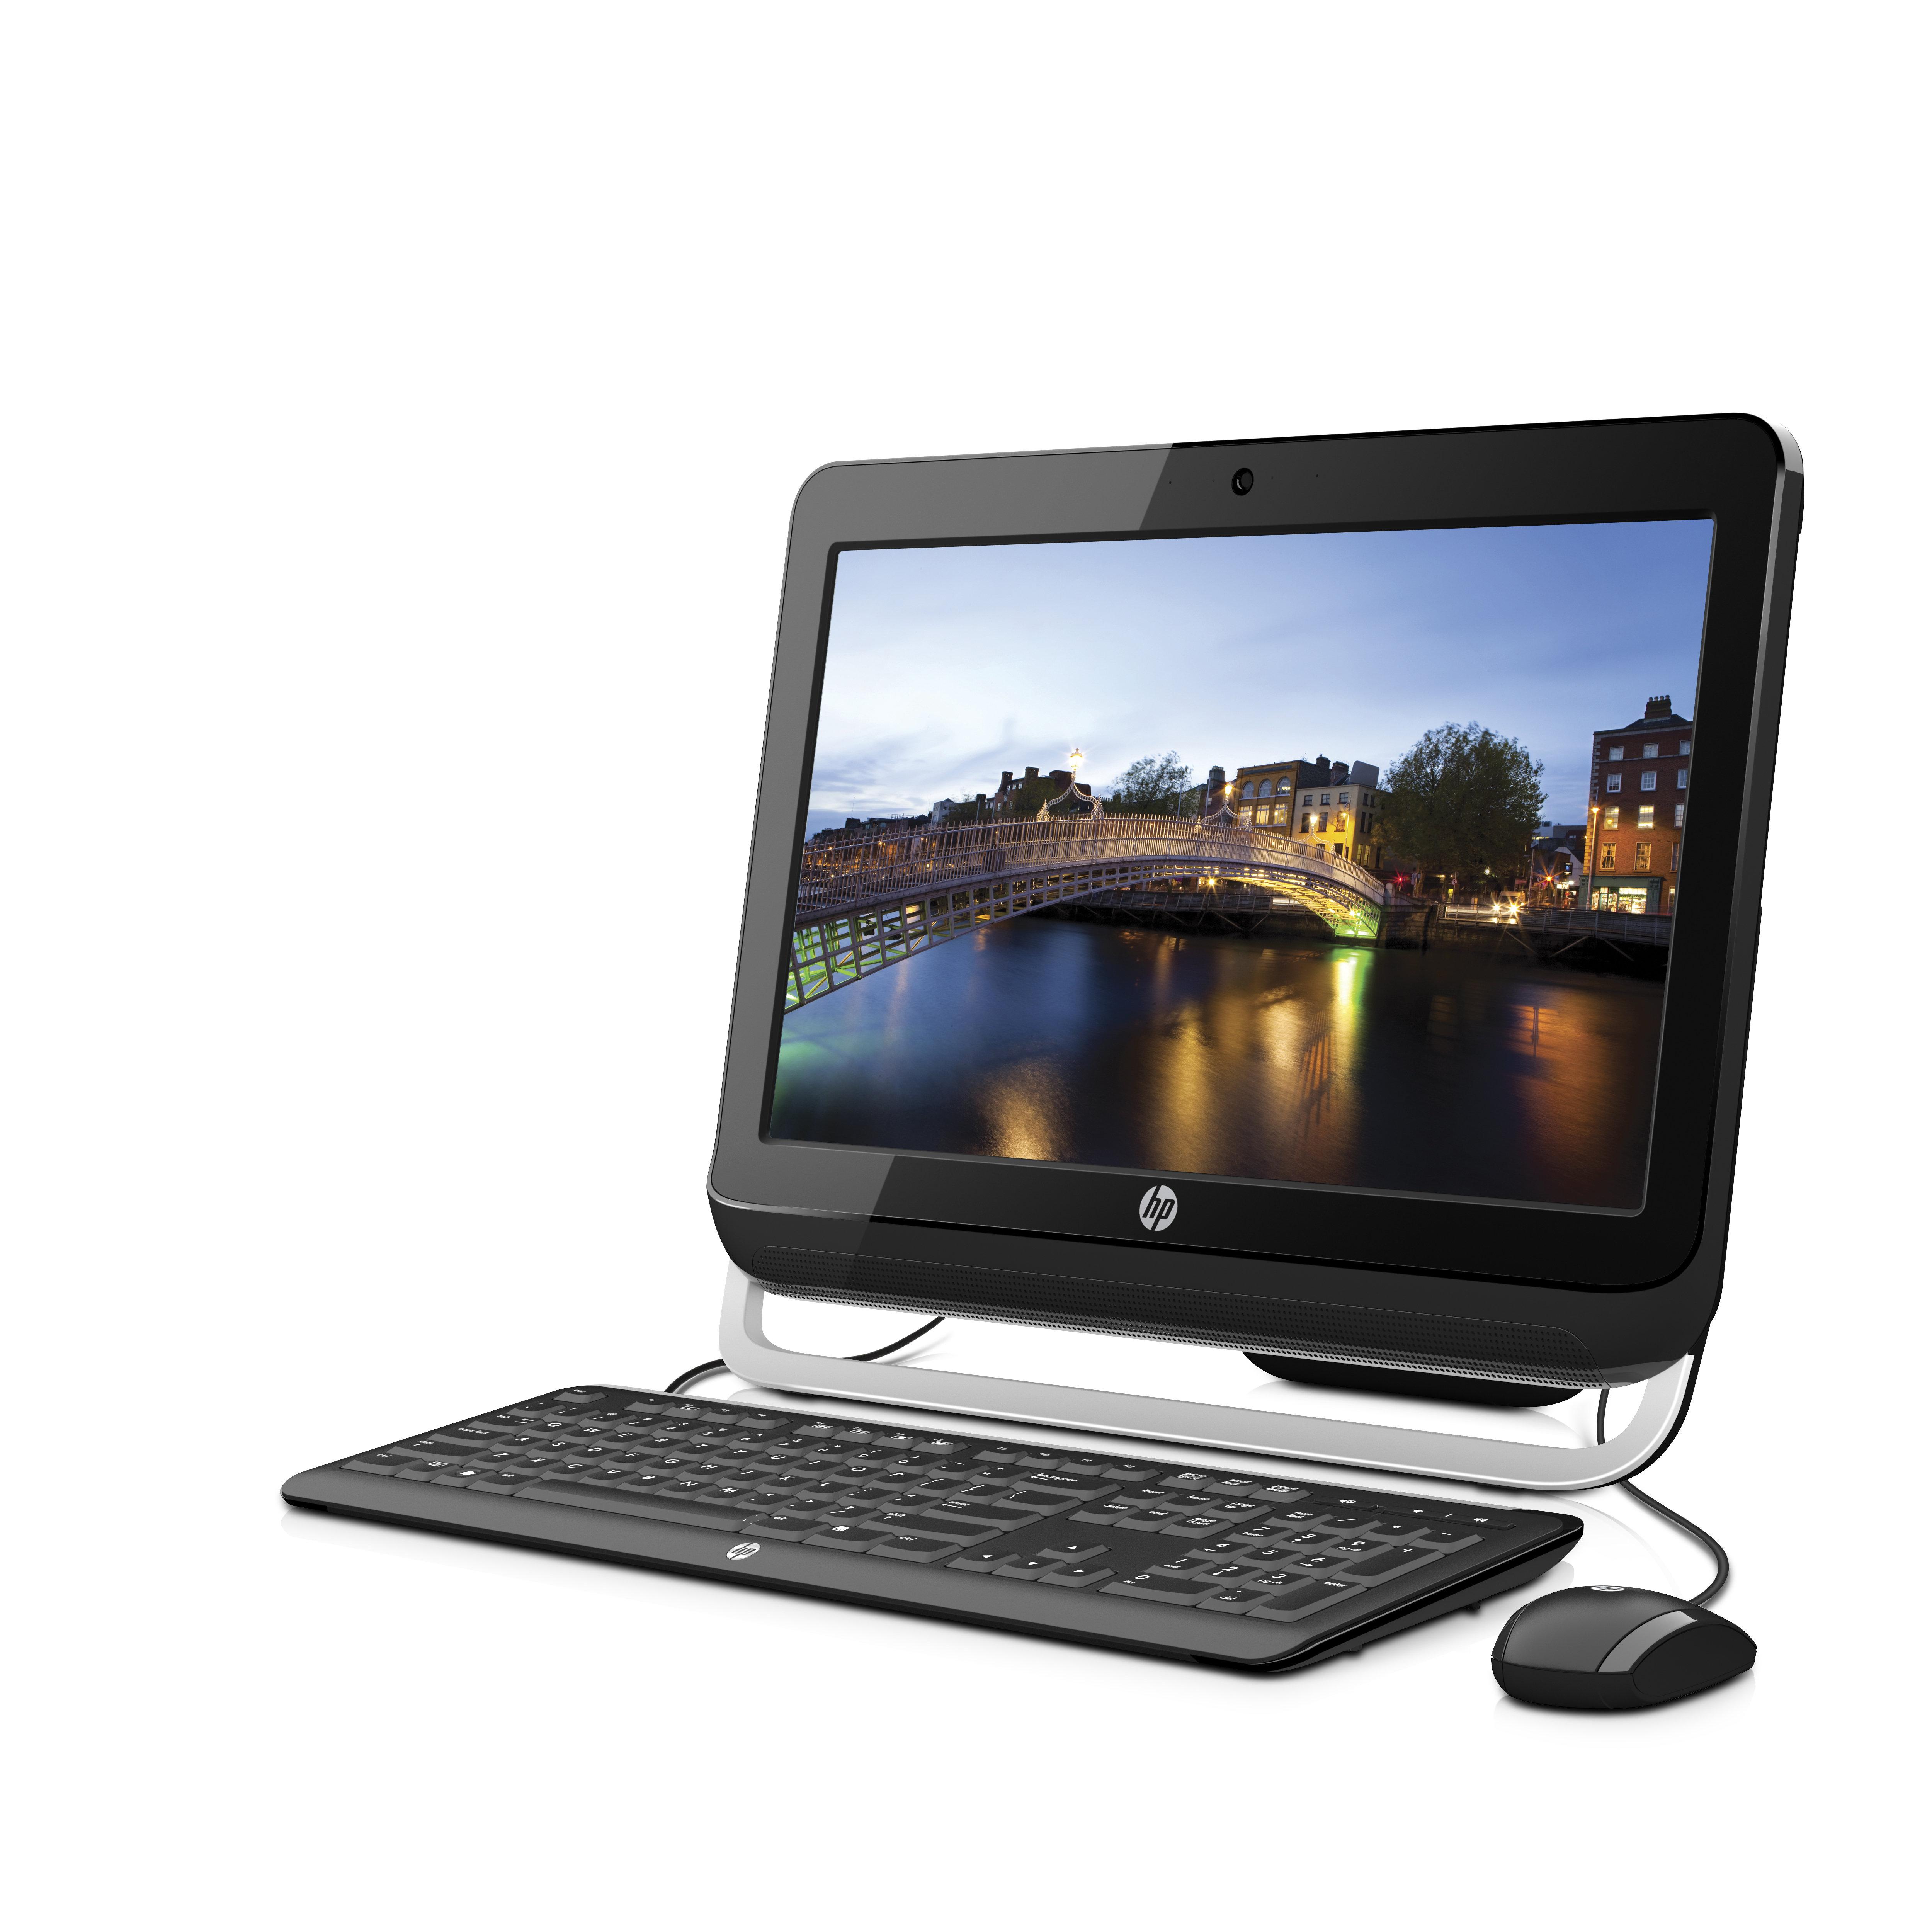 ... HDD, Windows 7 Home Premium): Amazon.co.uk: Computers